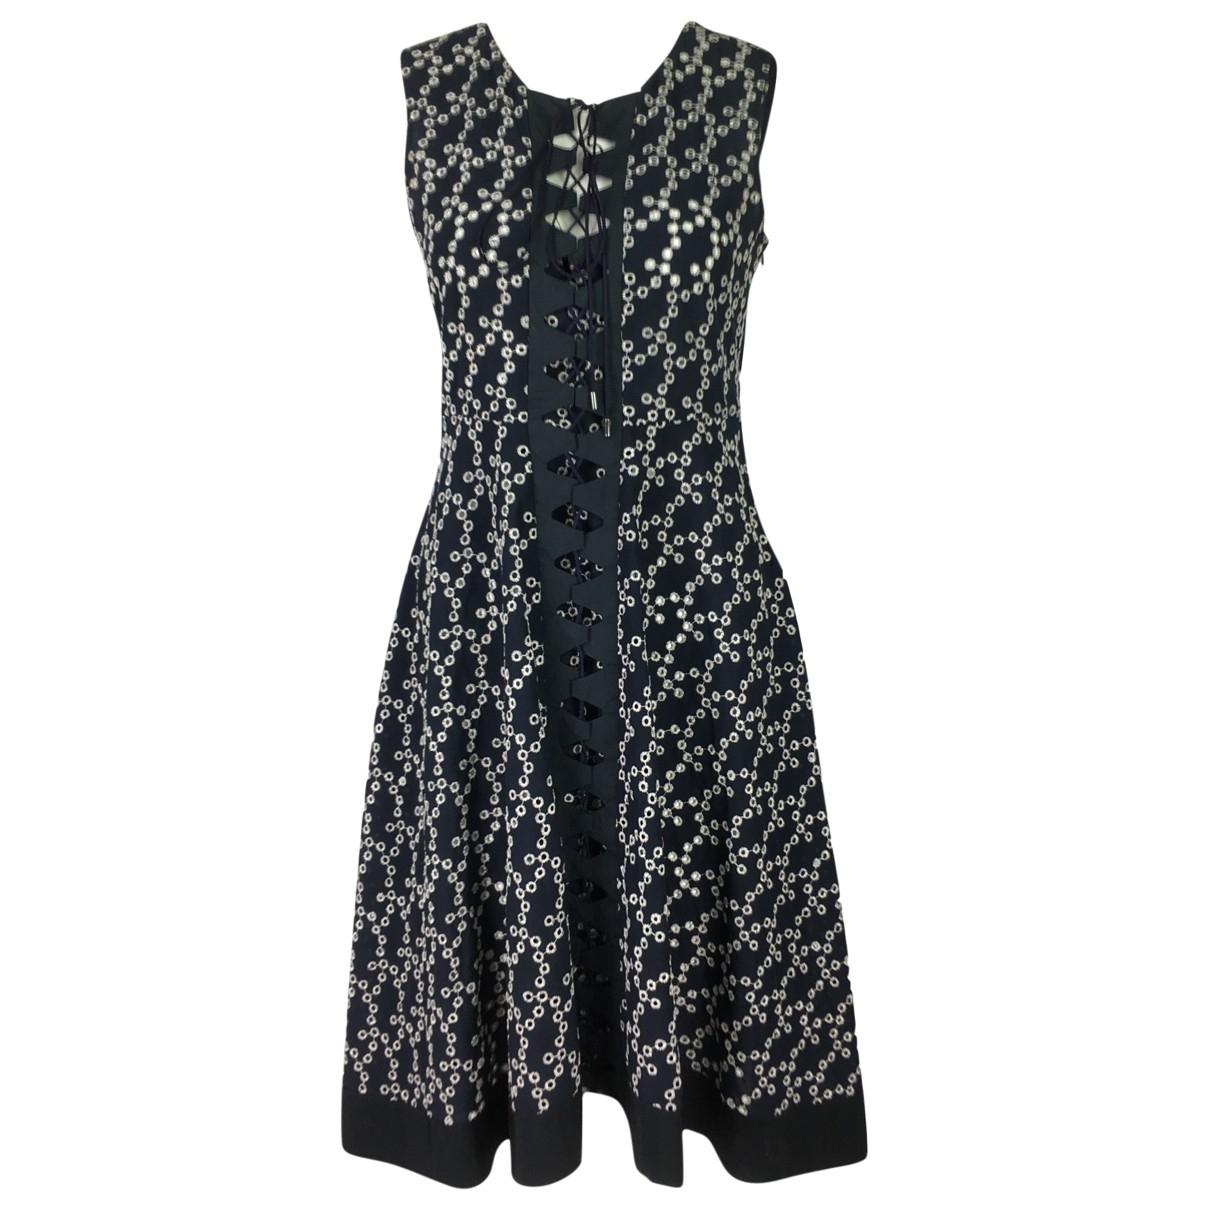 Dorothee Schumacher \N Kleid in  Blau Baumwolle